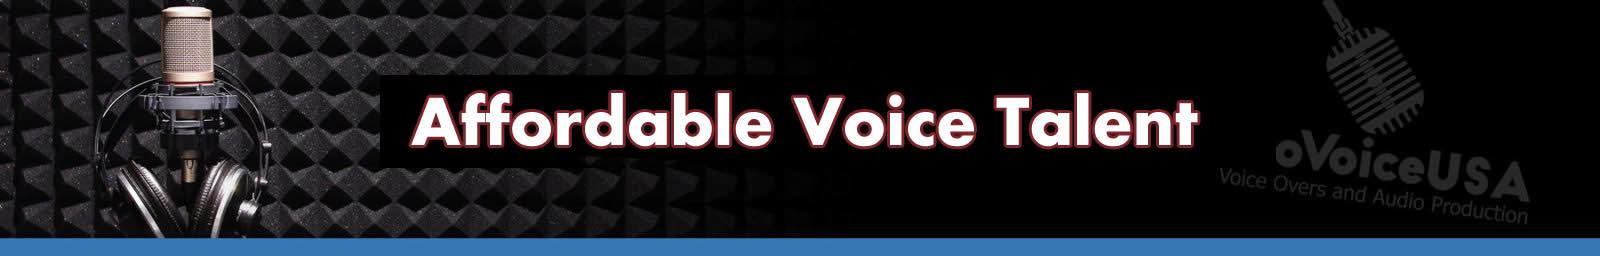 Affordable Voice Talent header